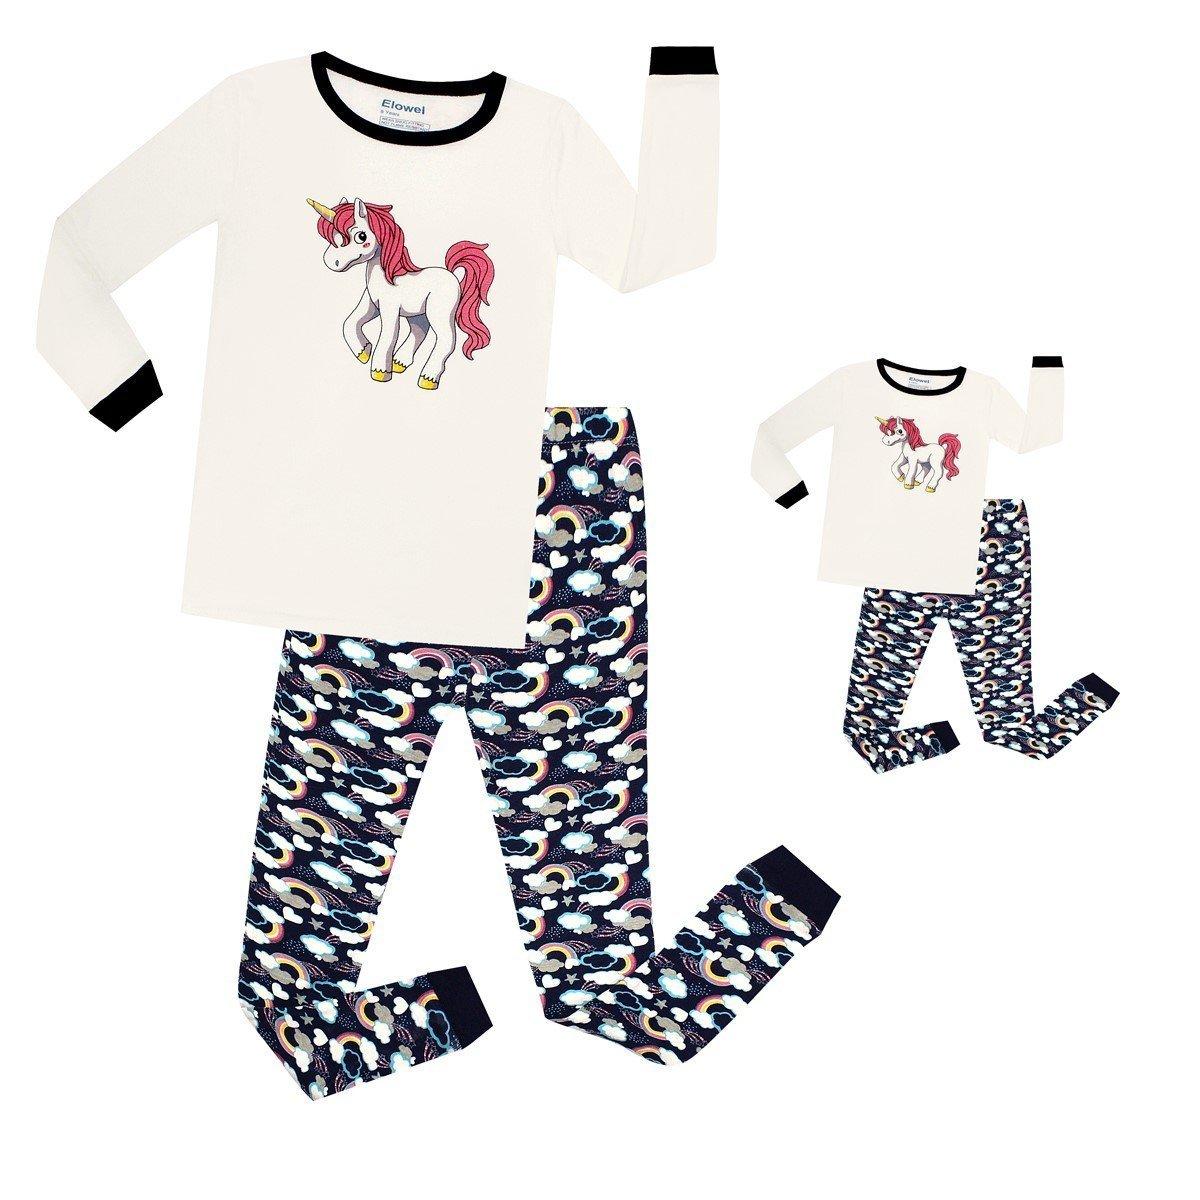 Elowel Unicorn Matching Girl & Doll 2 Piece Pajama Set 100% Cotton (Size 2-12 Years) Elowel Pajamas LFT1713B